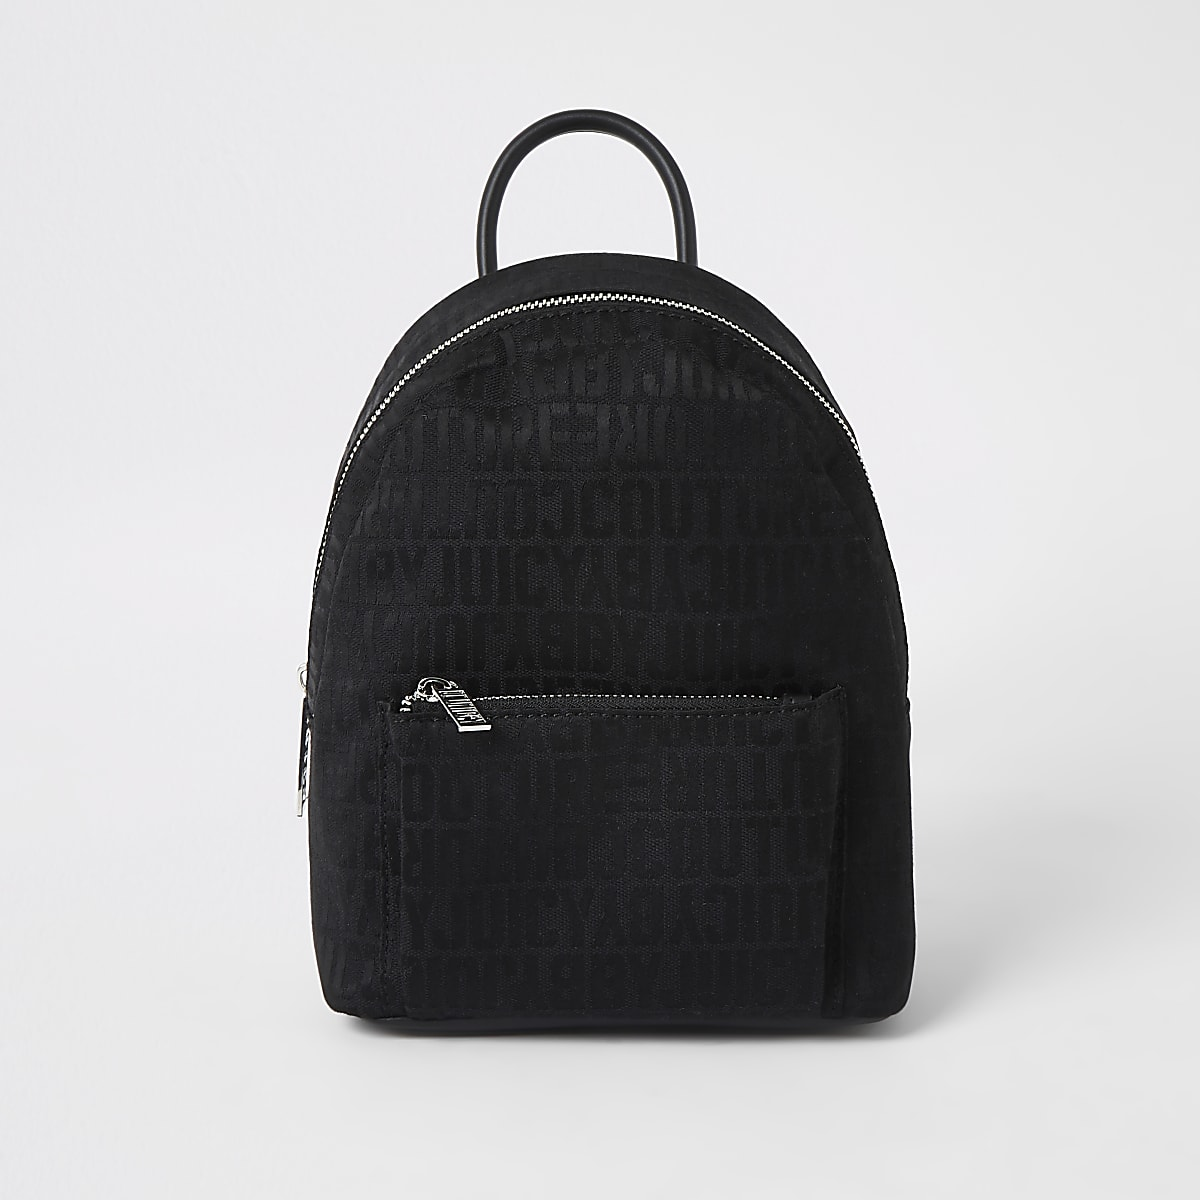 Juicy Couture - Zwarte kleine rugzak met monogram